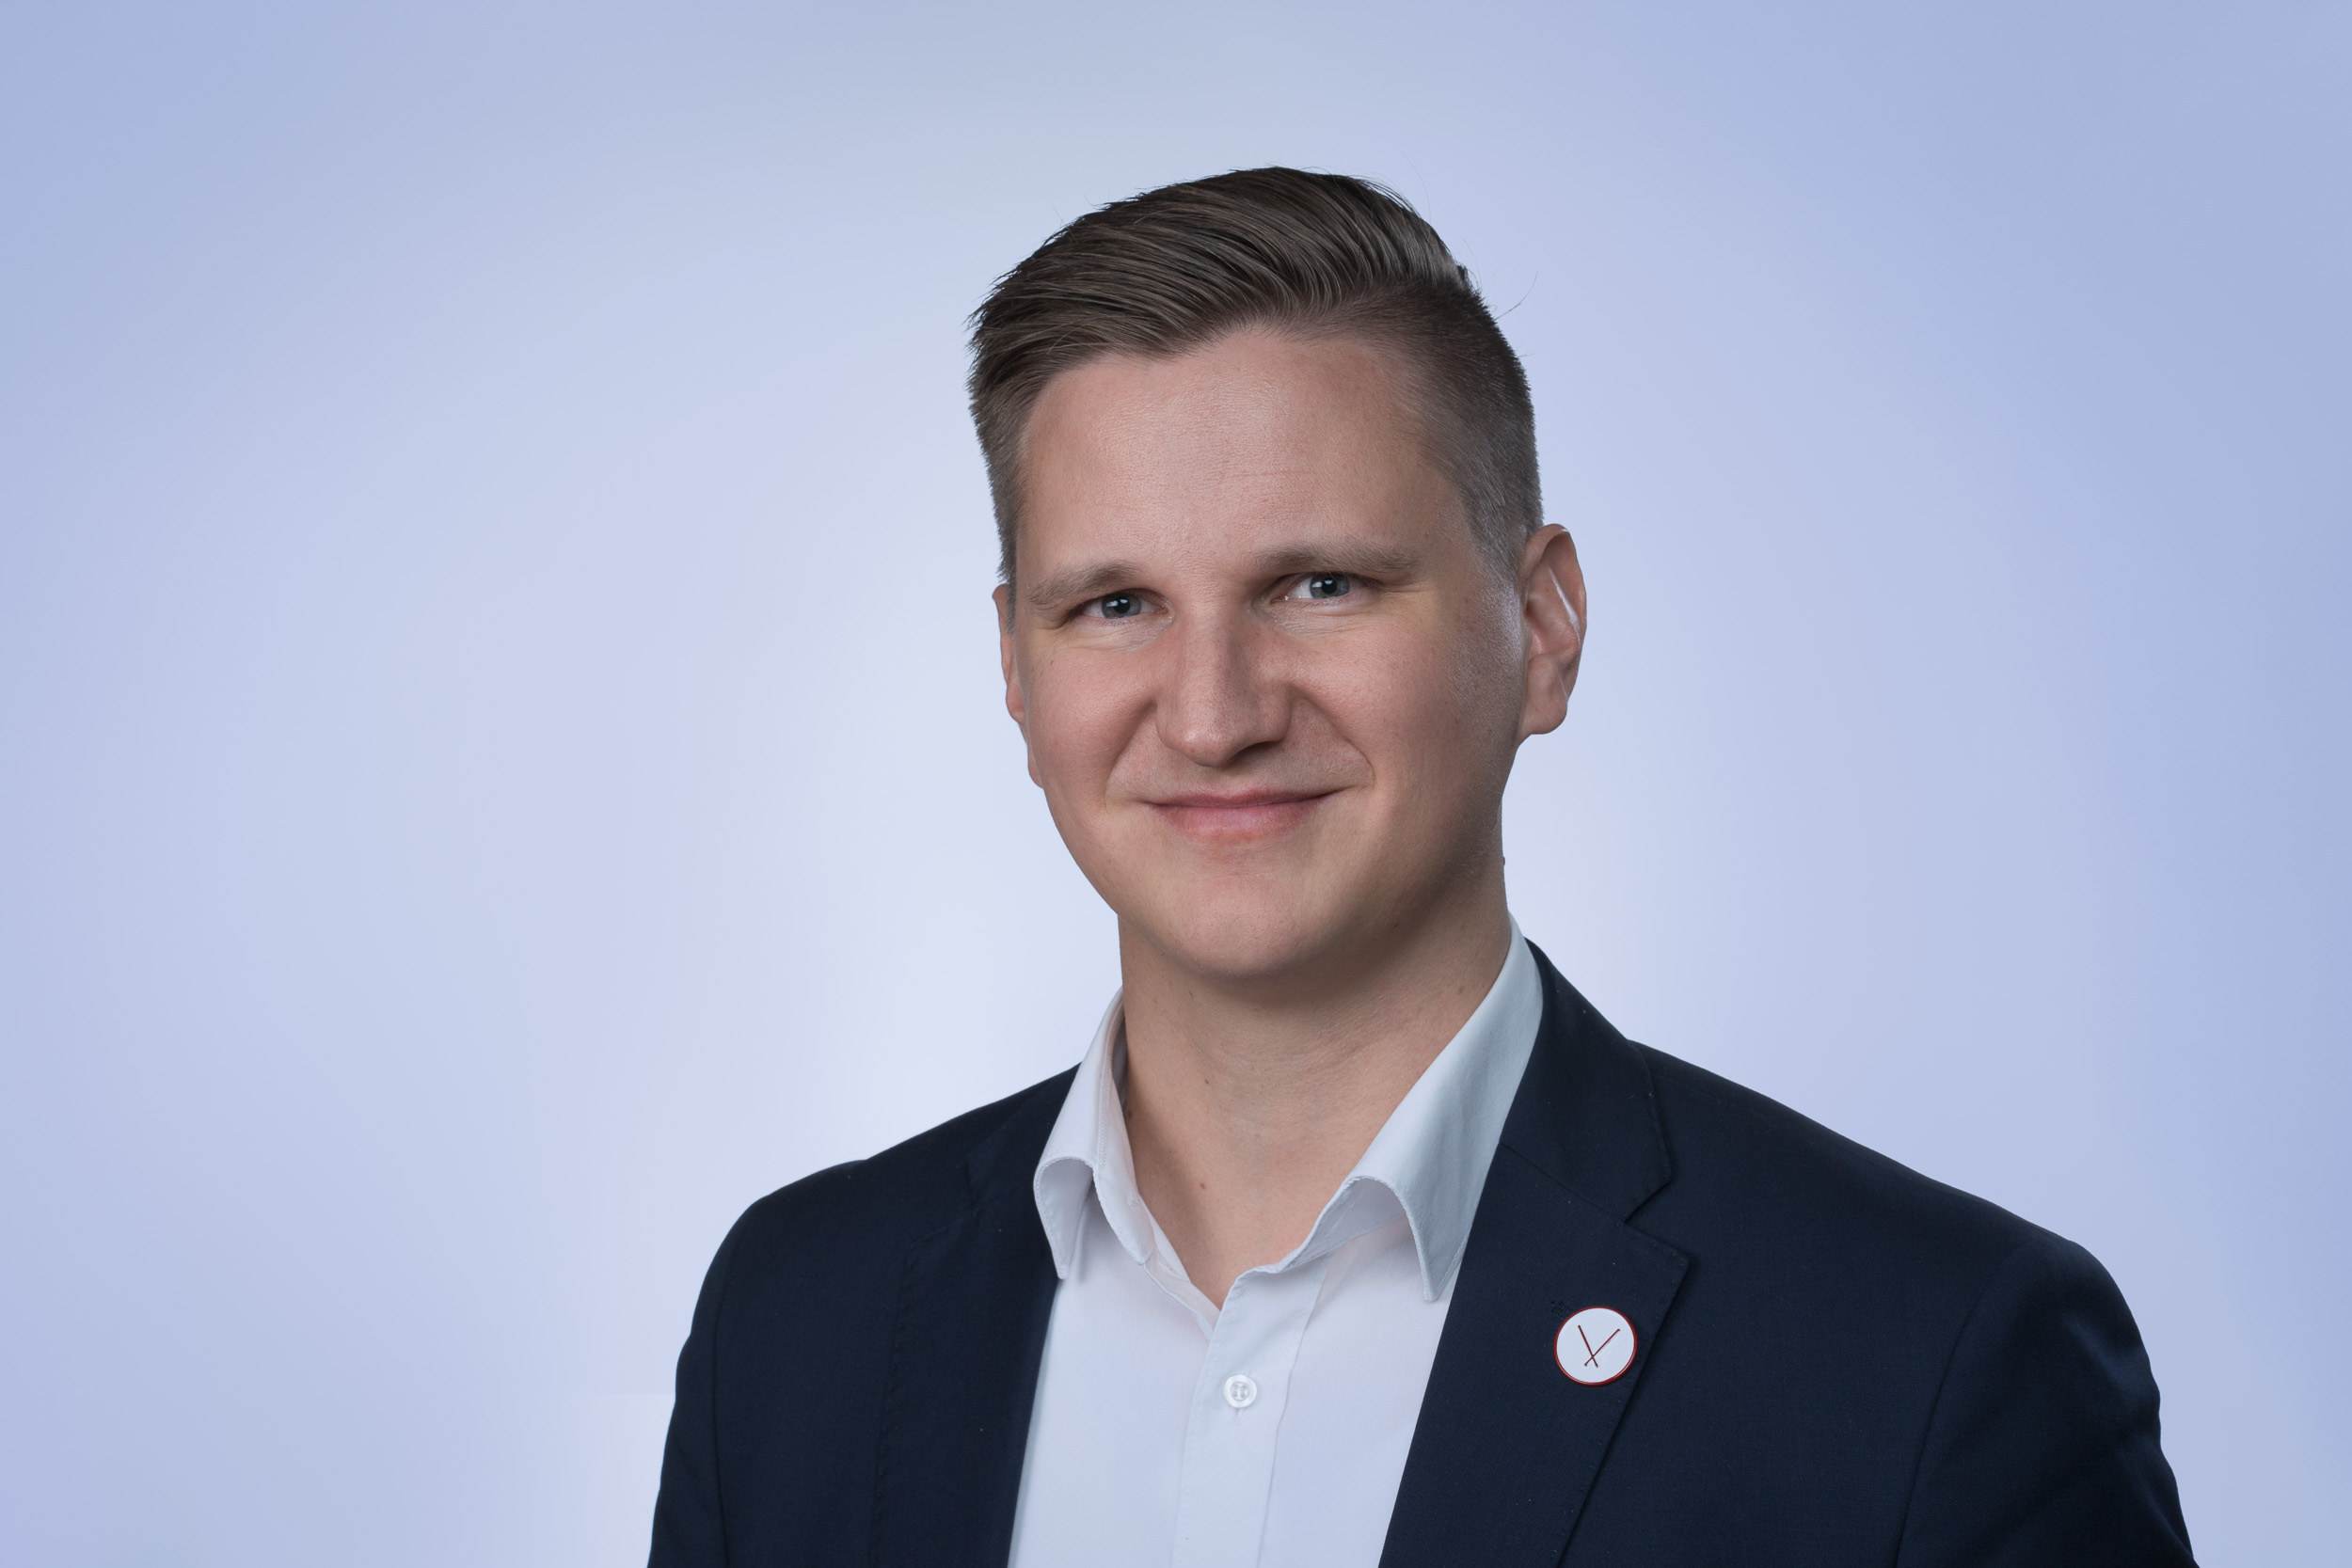 Mikko Kiuttu-Cerell